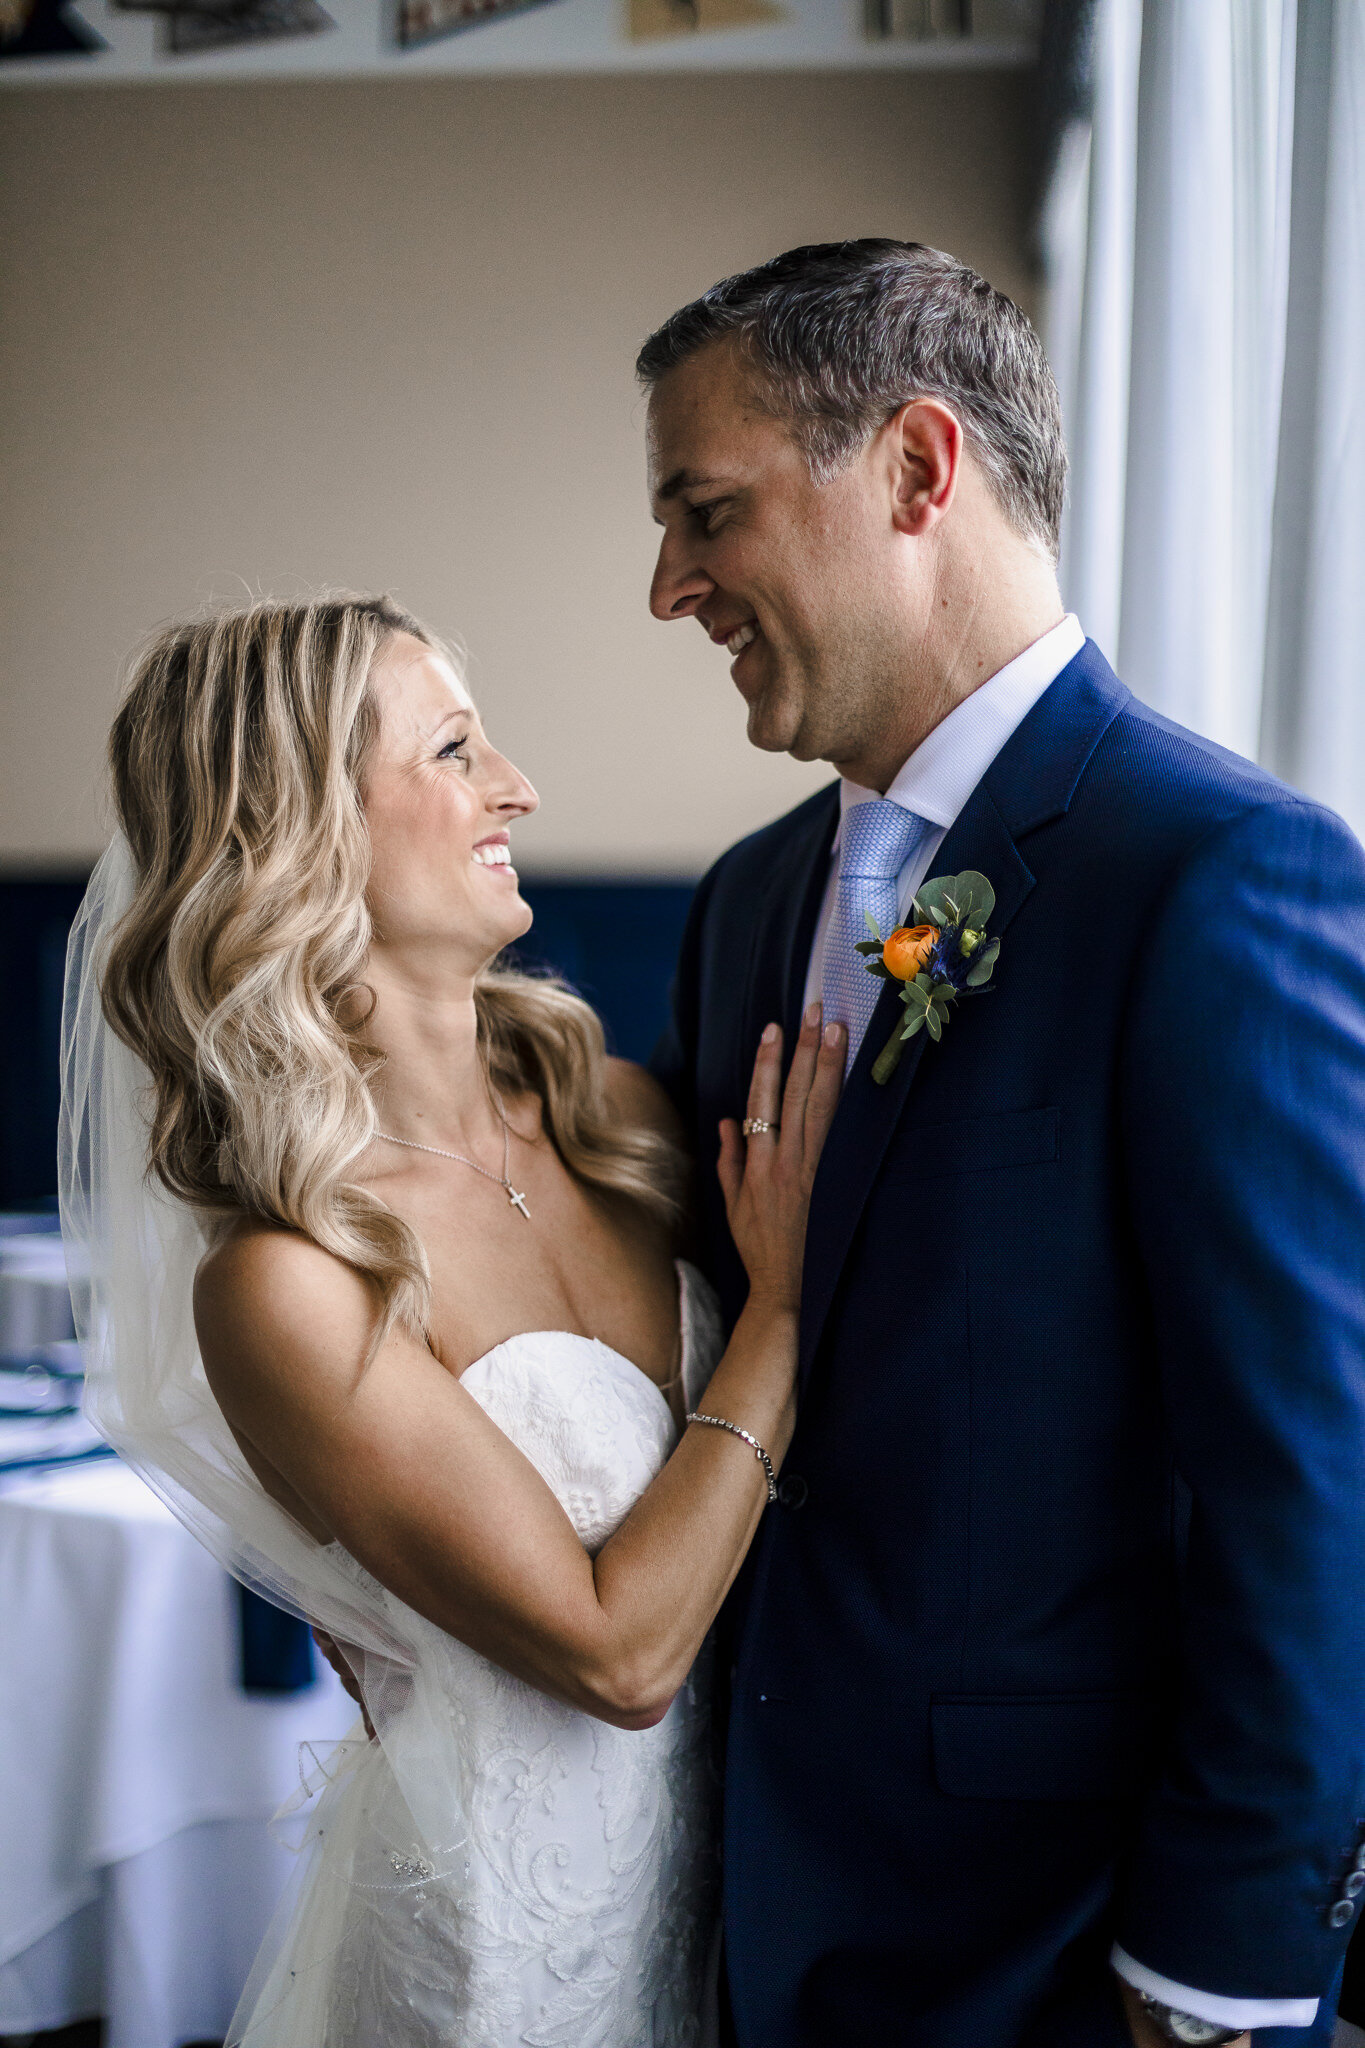 Snell-Ocean-City-Yacht-Club-New-Jersey-Wedding-Photographer-15.JPG